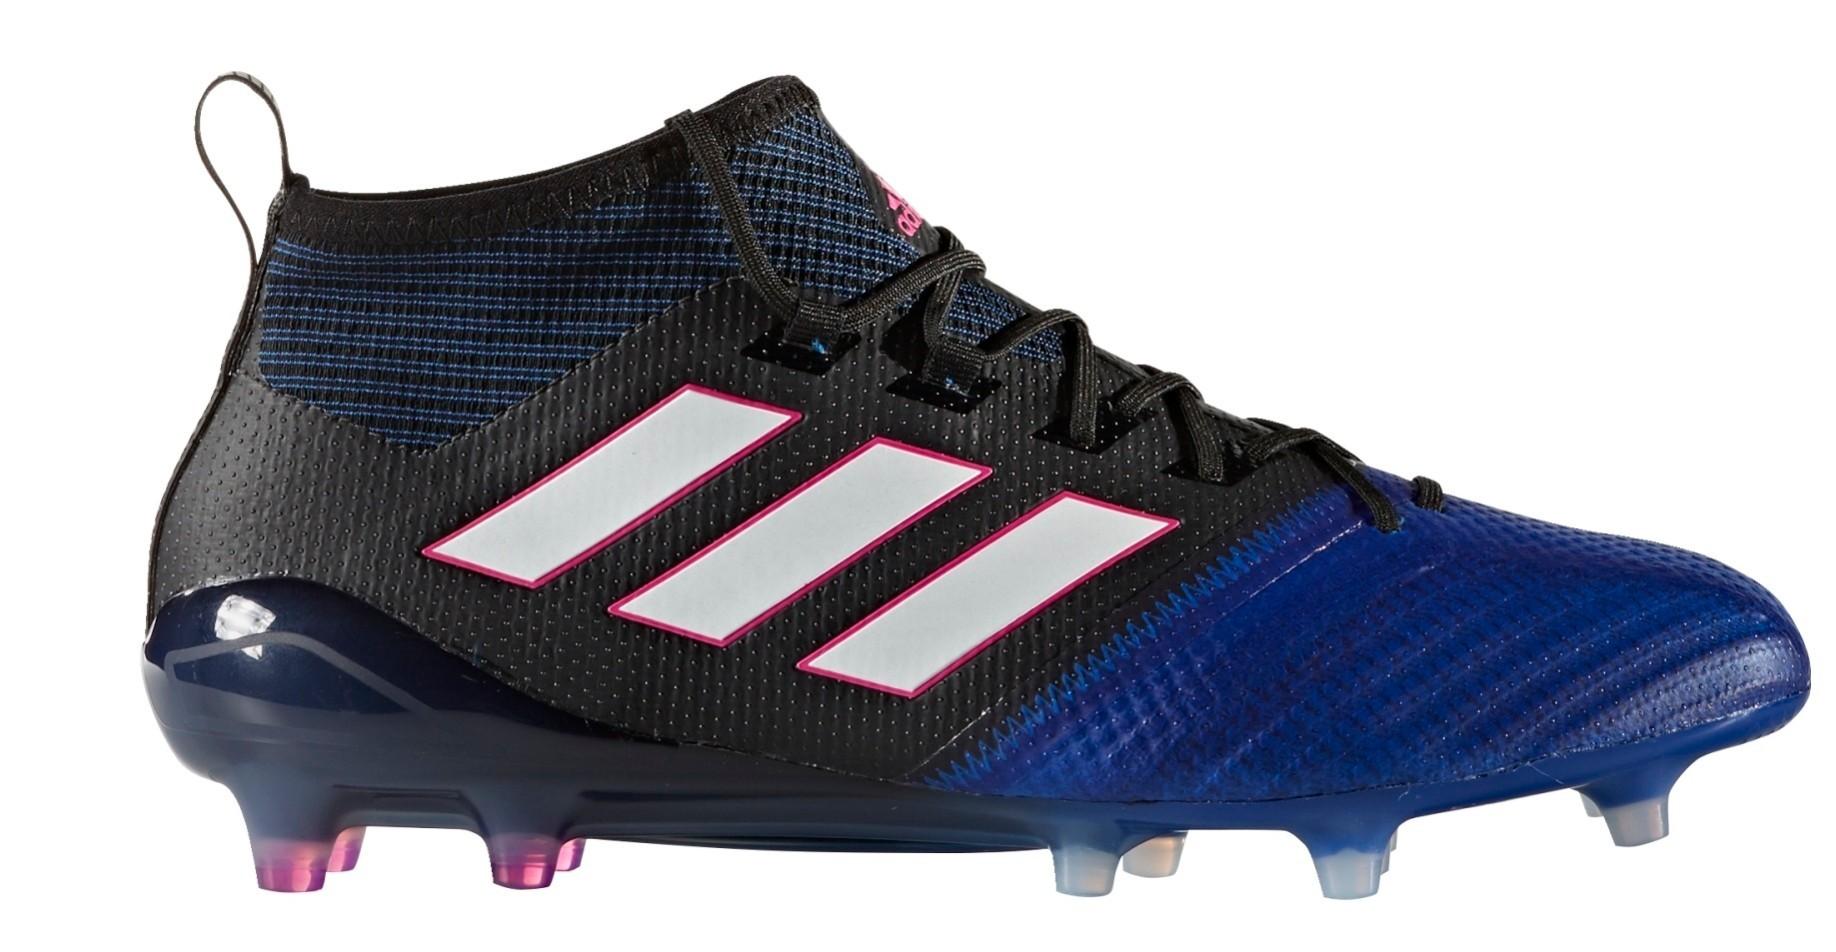 separation shoes 56fcd 9e337 Adidas Football boots Ace 17.1 PrimeKnit FG Blue Blast Pack colore Blue  Light blue - Adidas - SportIT.com